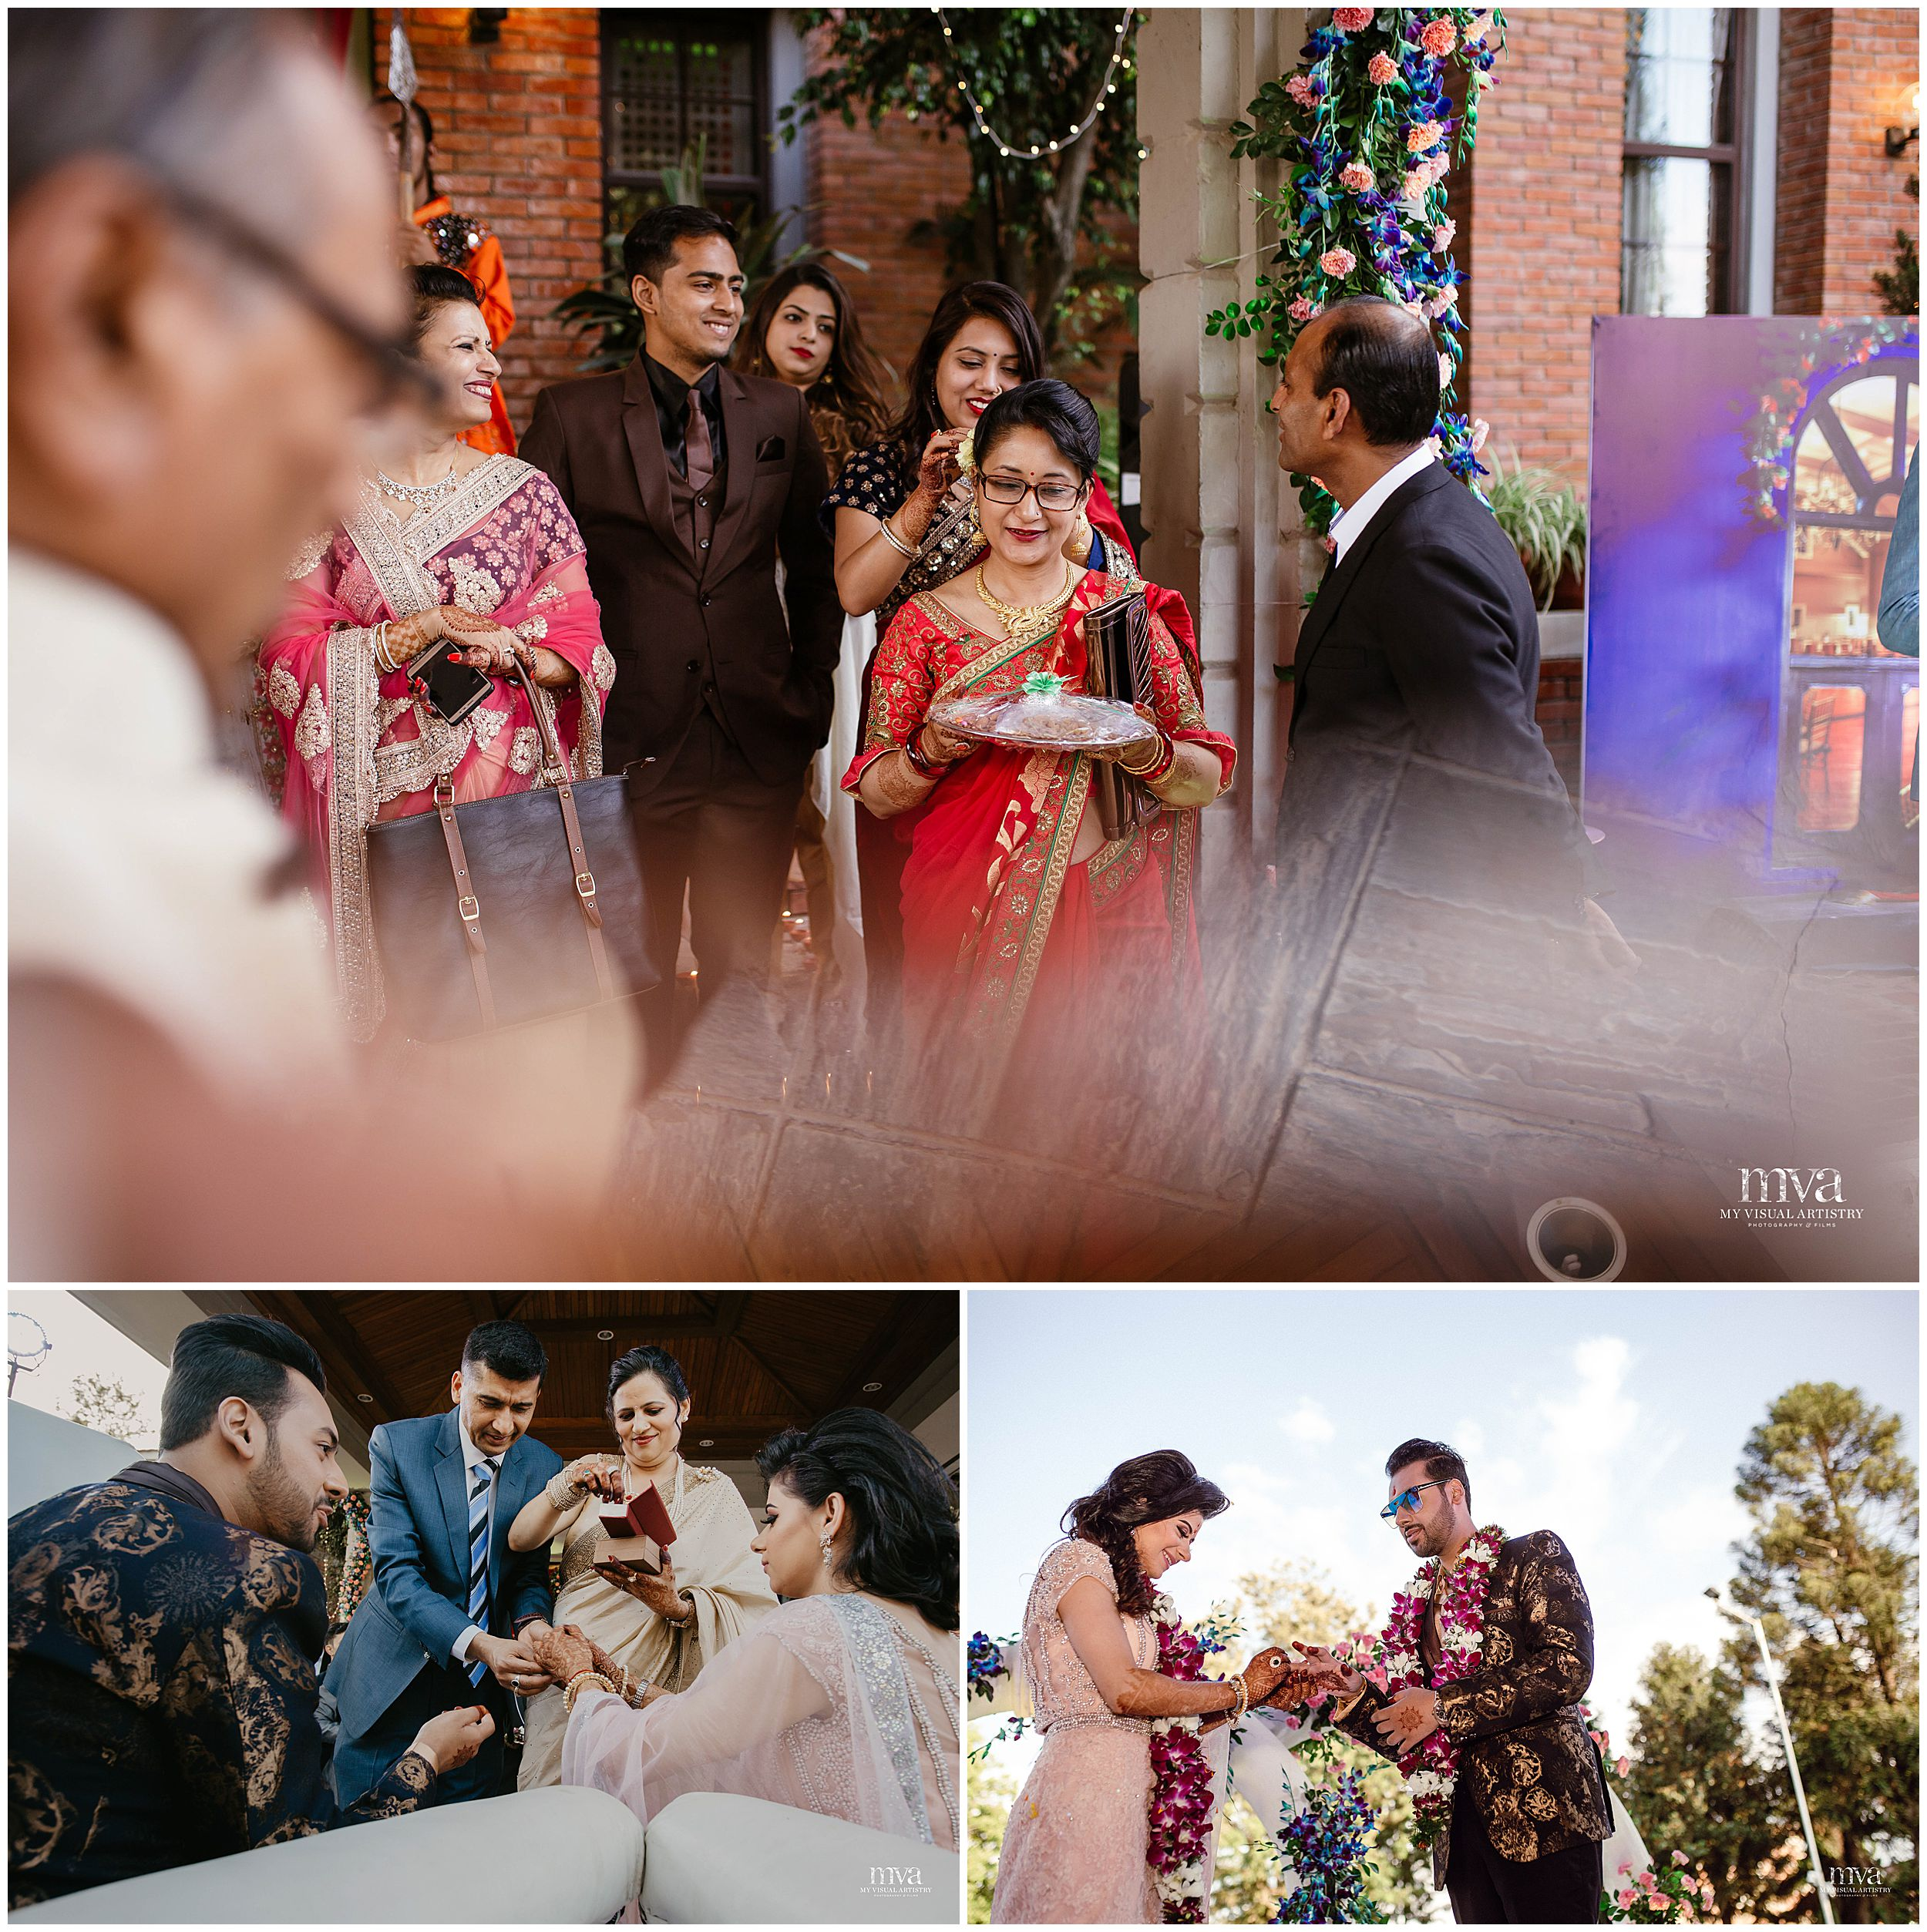 SONAAL_AMI_MYVISUALARTISTRY_WEDDING_PHOTOGRAPHY_MVA_NEPAL_KATHMANDU_SOALTEE11.jpg